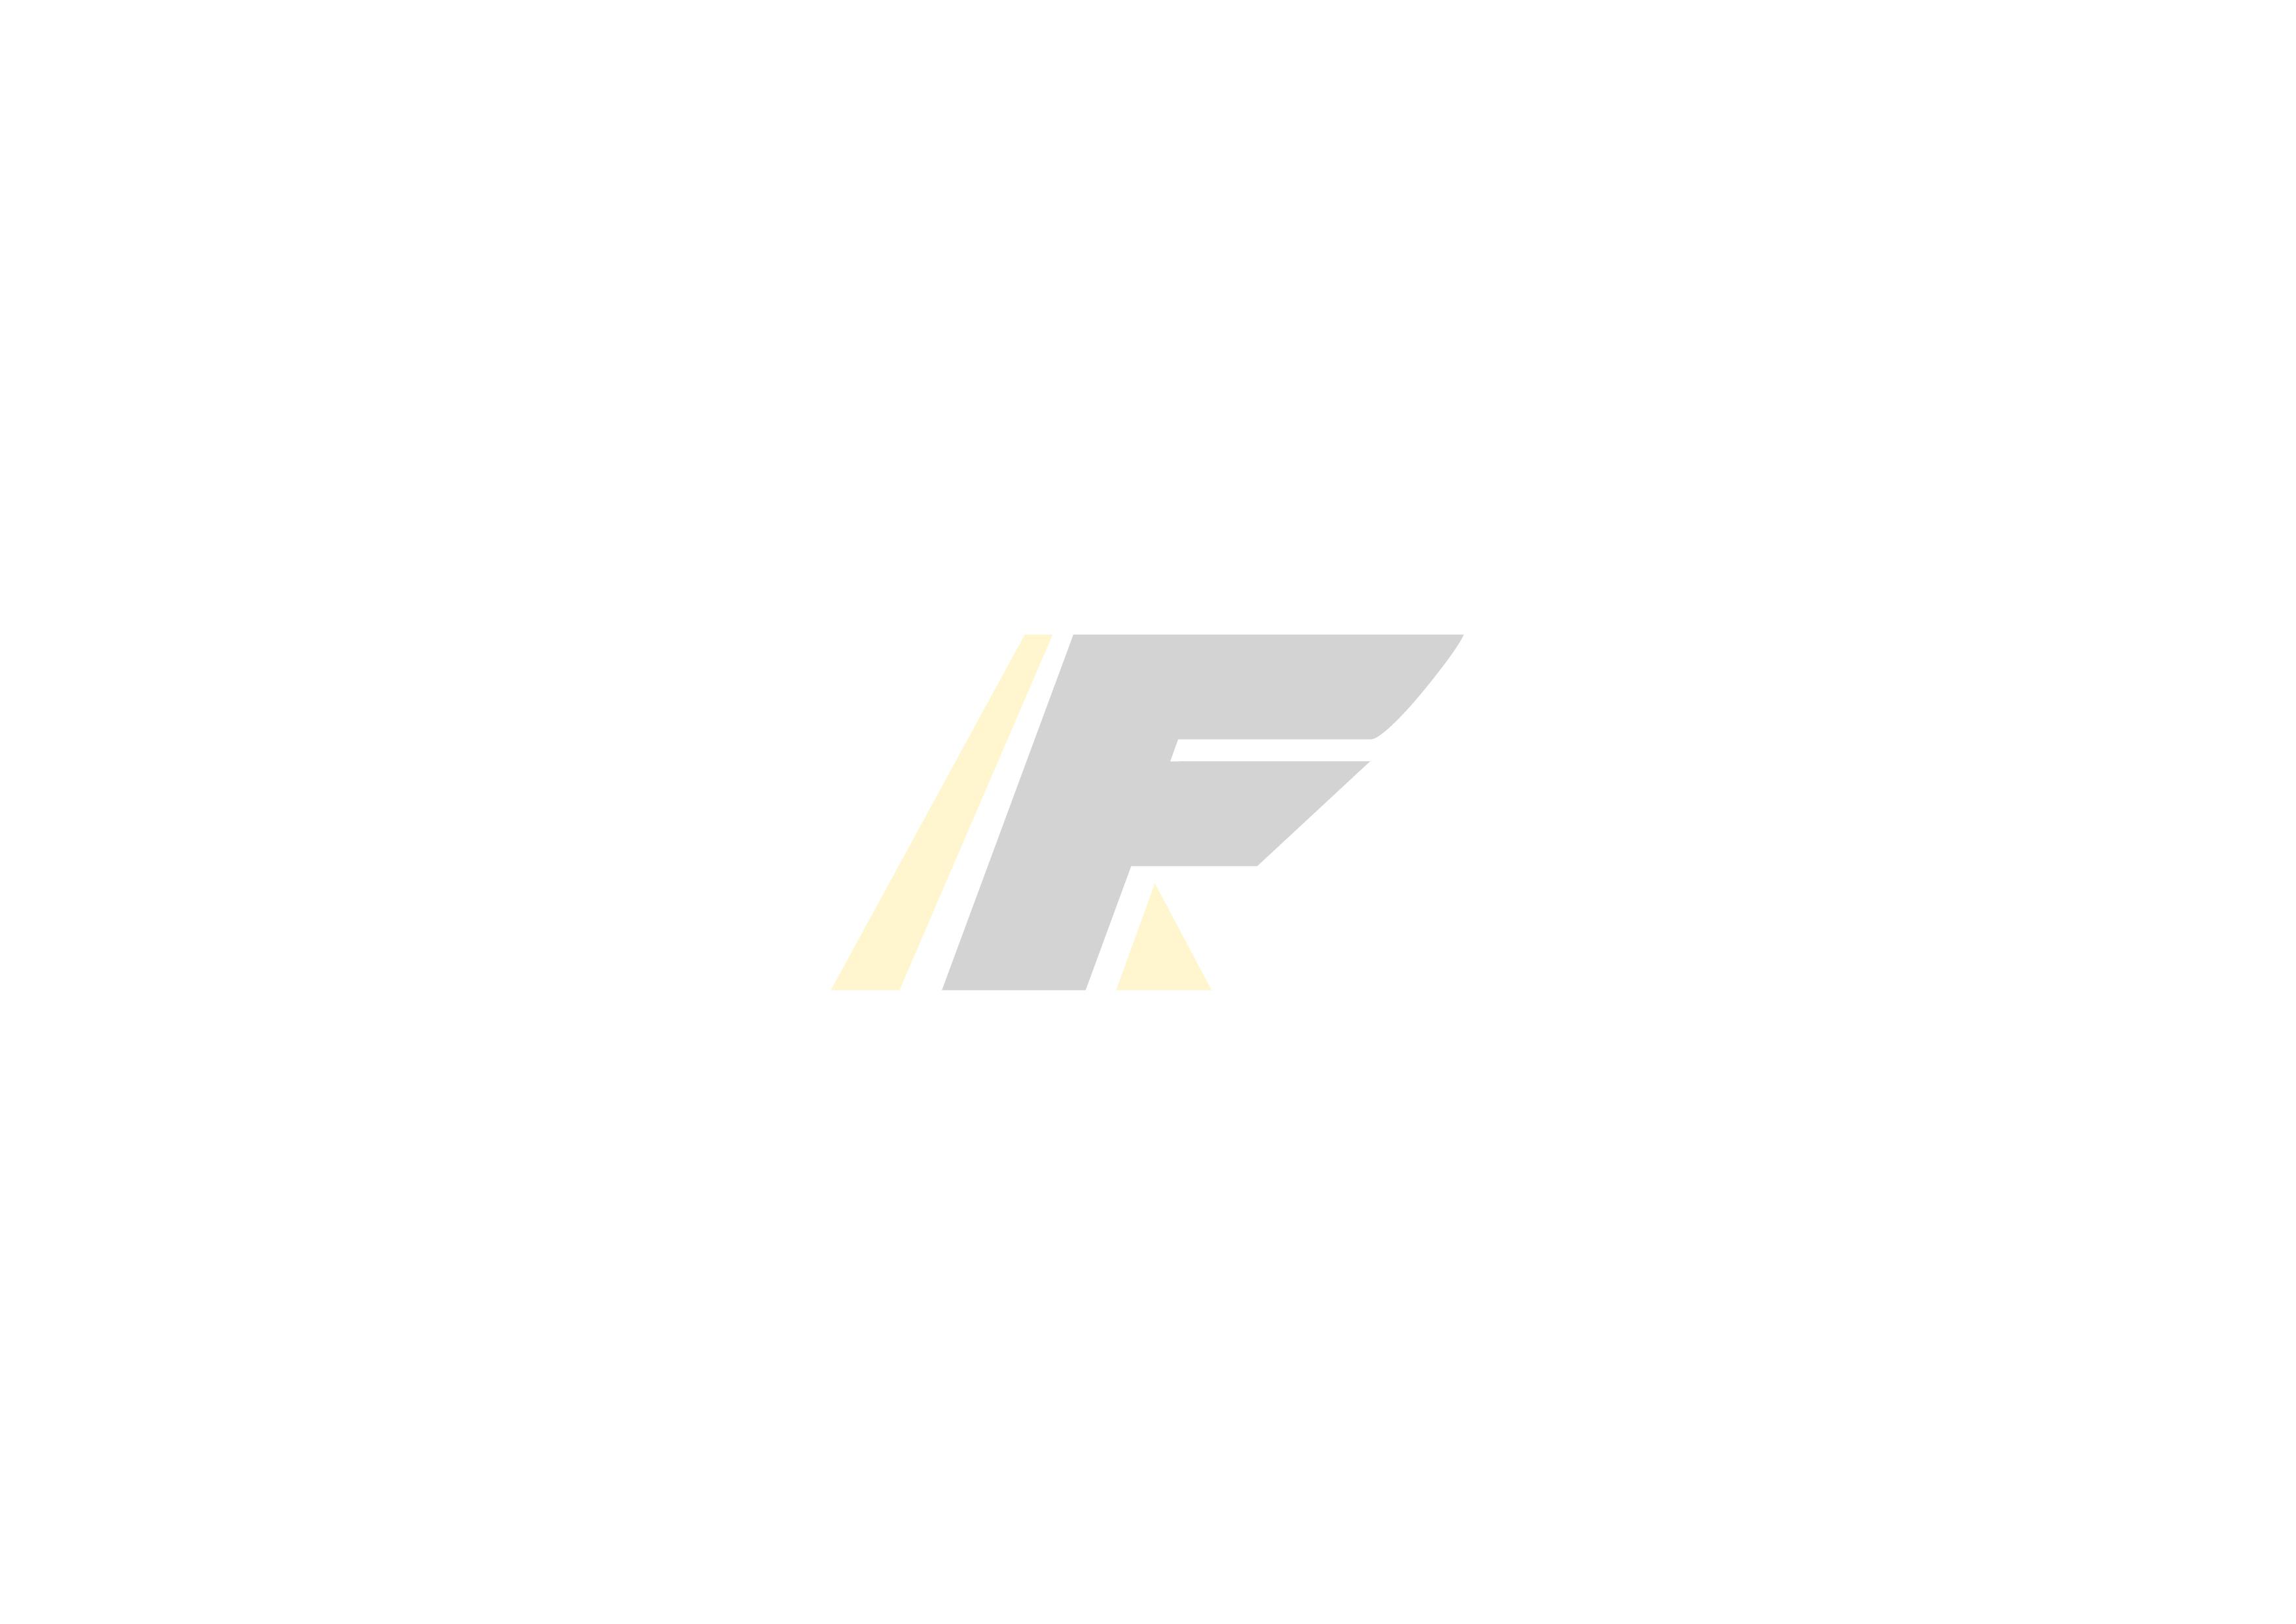 R&G Cotton Reels (Offset) - Honda CBR600RR/CBR1000RR